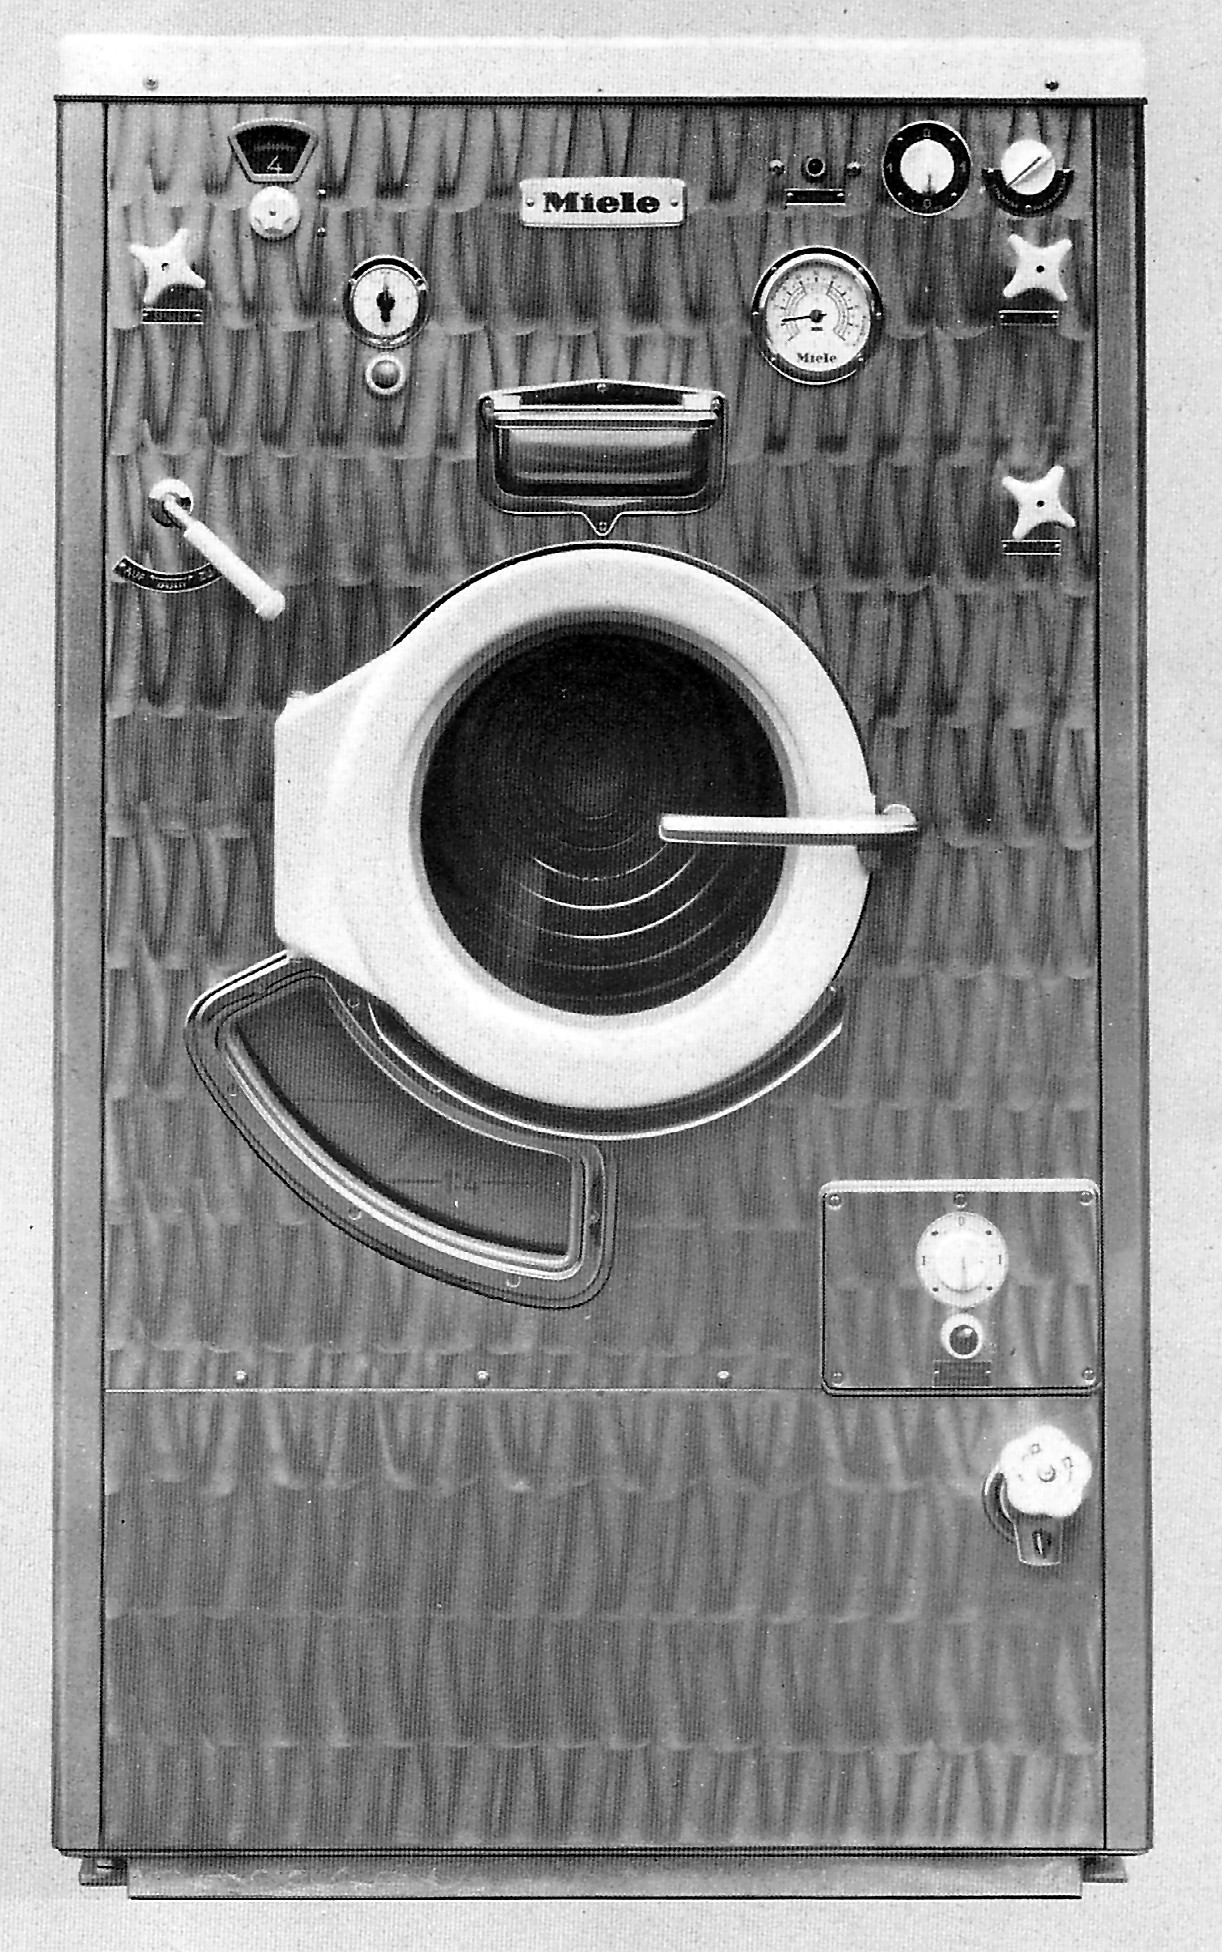 1954 1954 miele waschmaschine twa 120 fotos auf. Black Bedroom Furniture Sets. Home Design Ideas